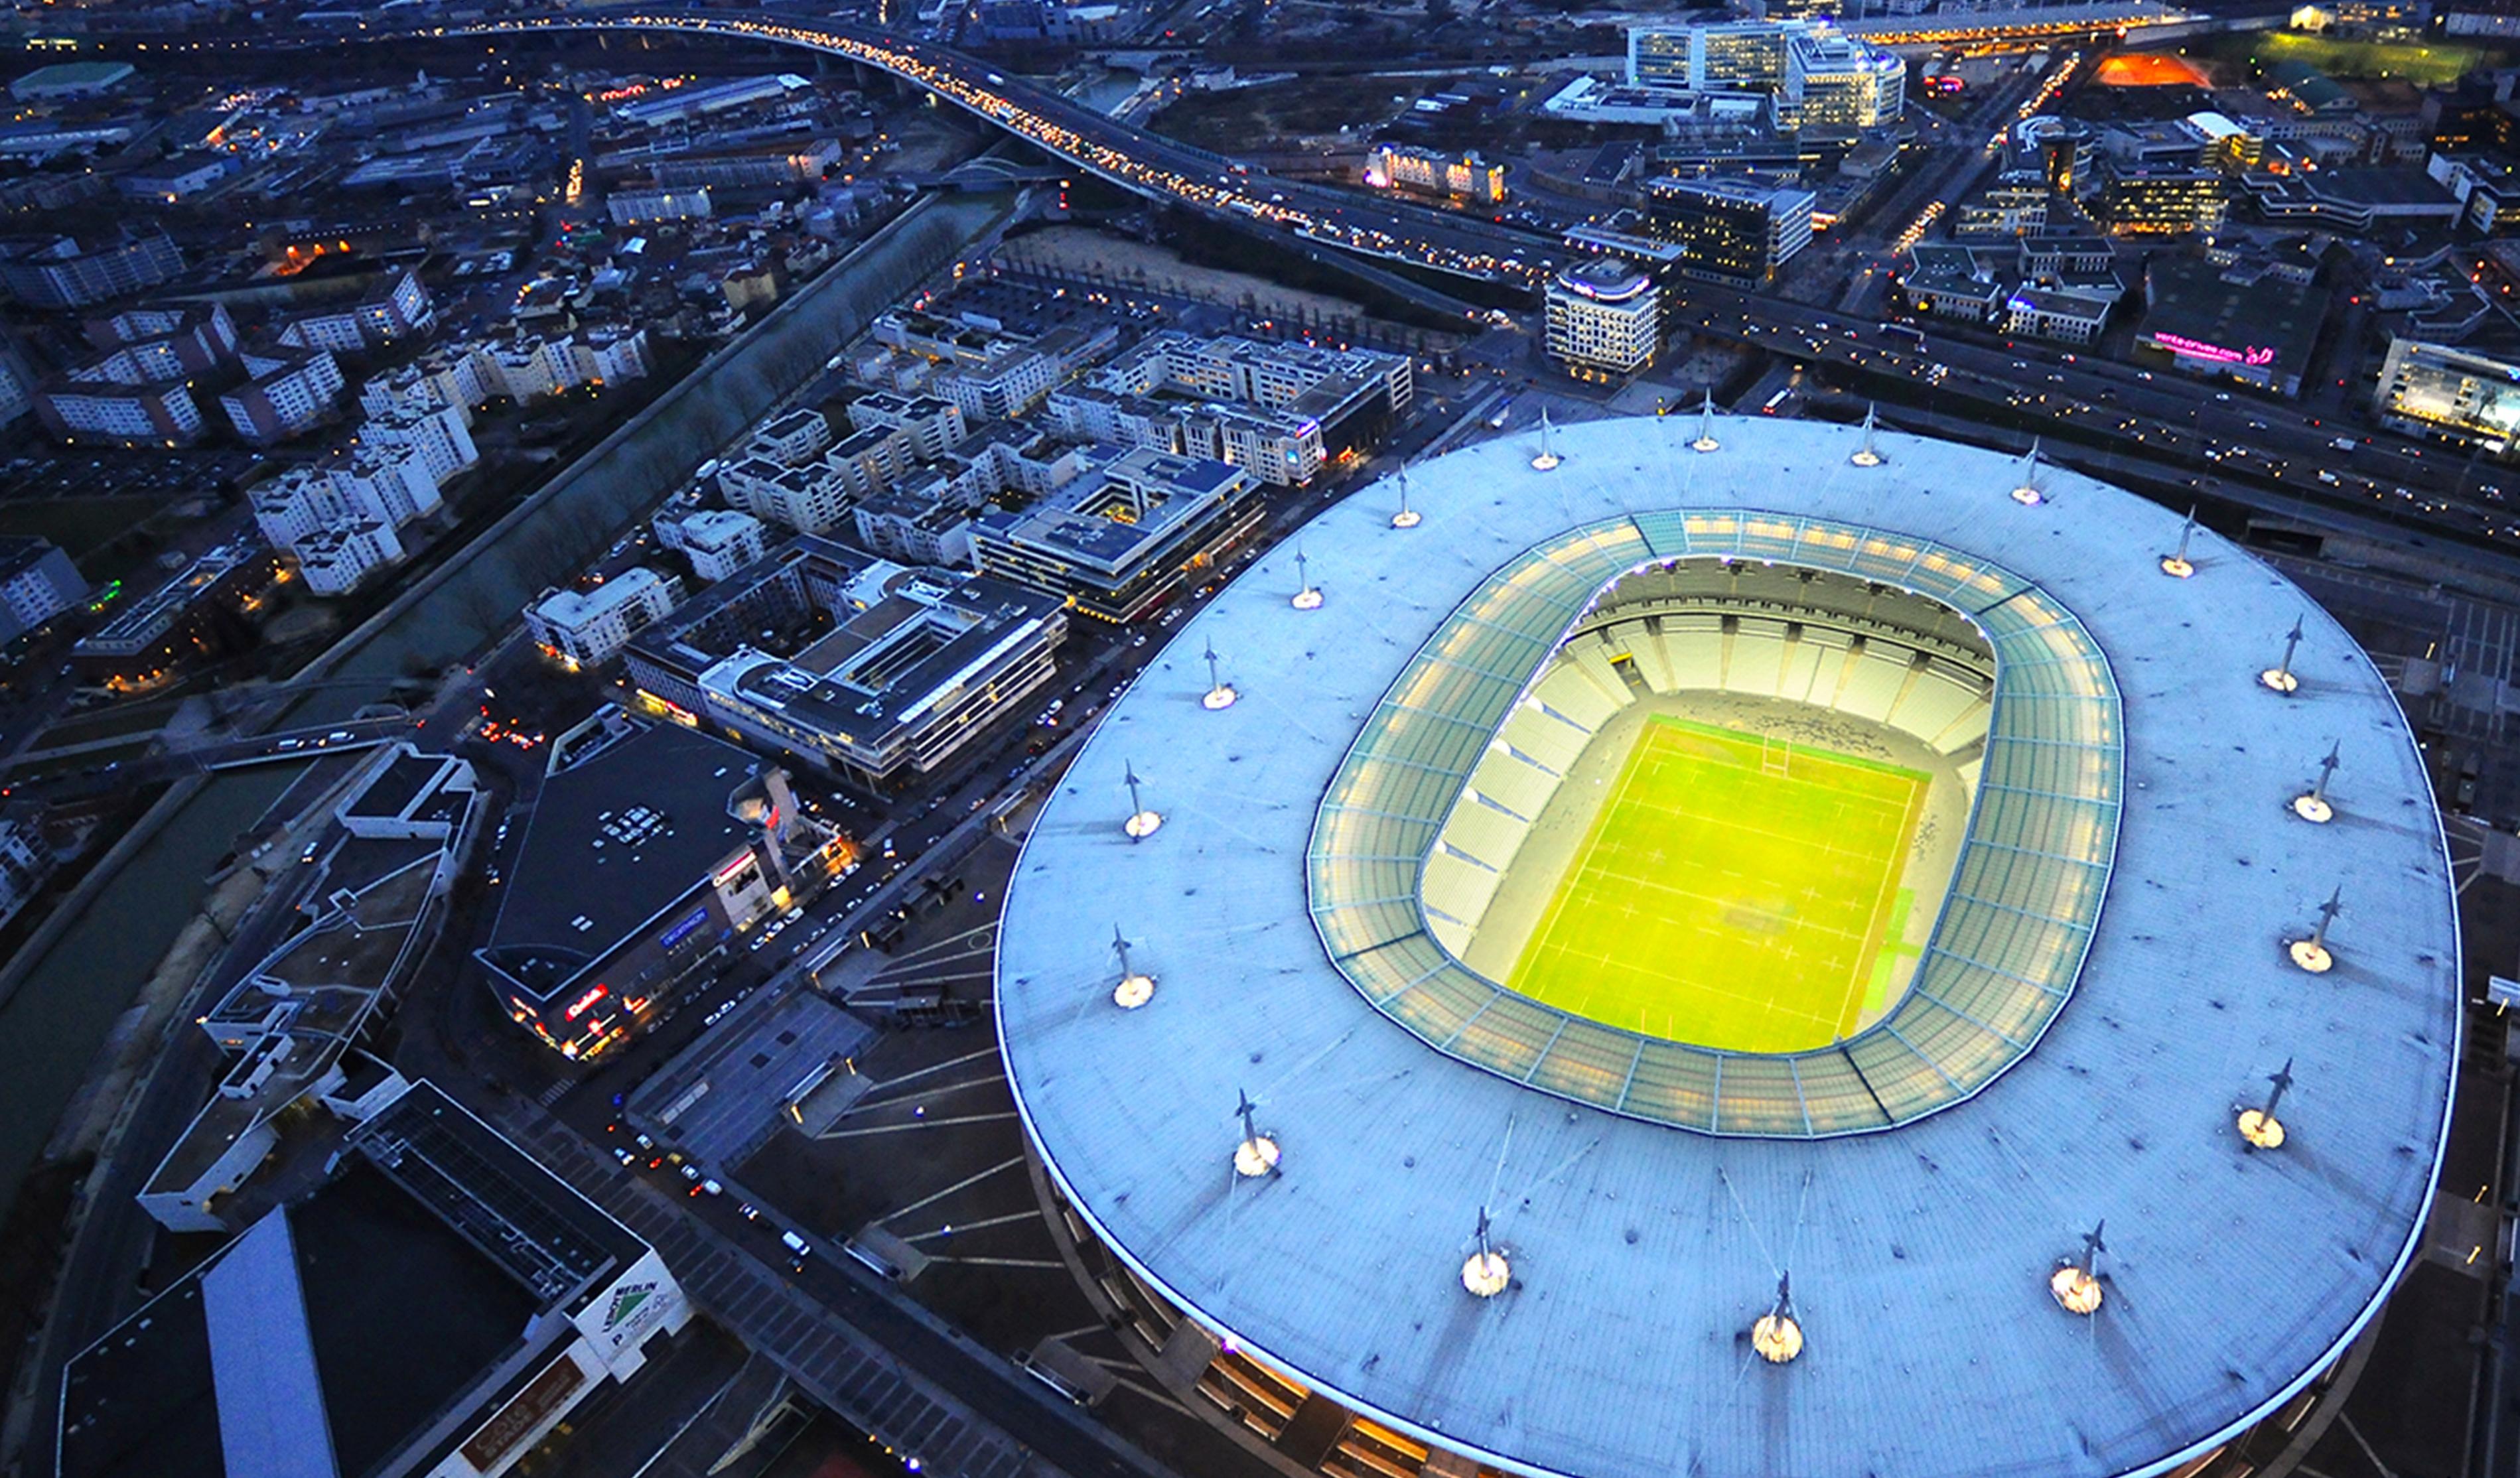 visit saint denis stade de france guided tour behind the scenes